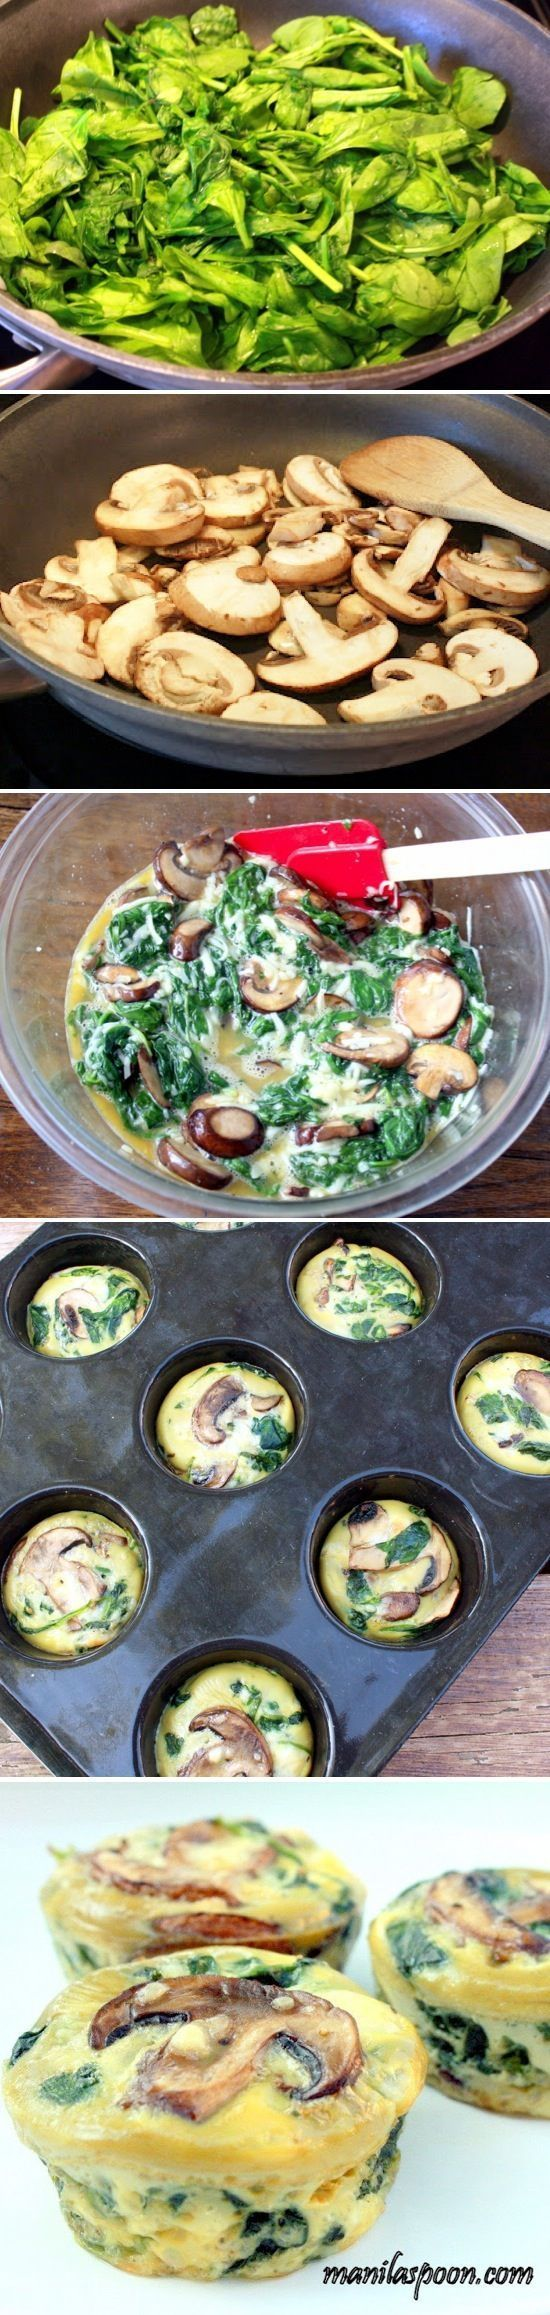 Spinach Egg Cups Healthy Breakfast Recipes - breakfast, gluten free, healthy, recipes, vegetarian